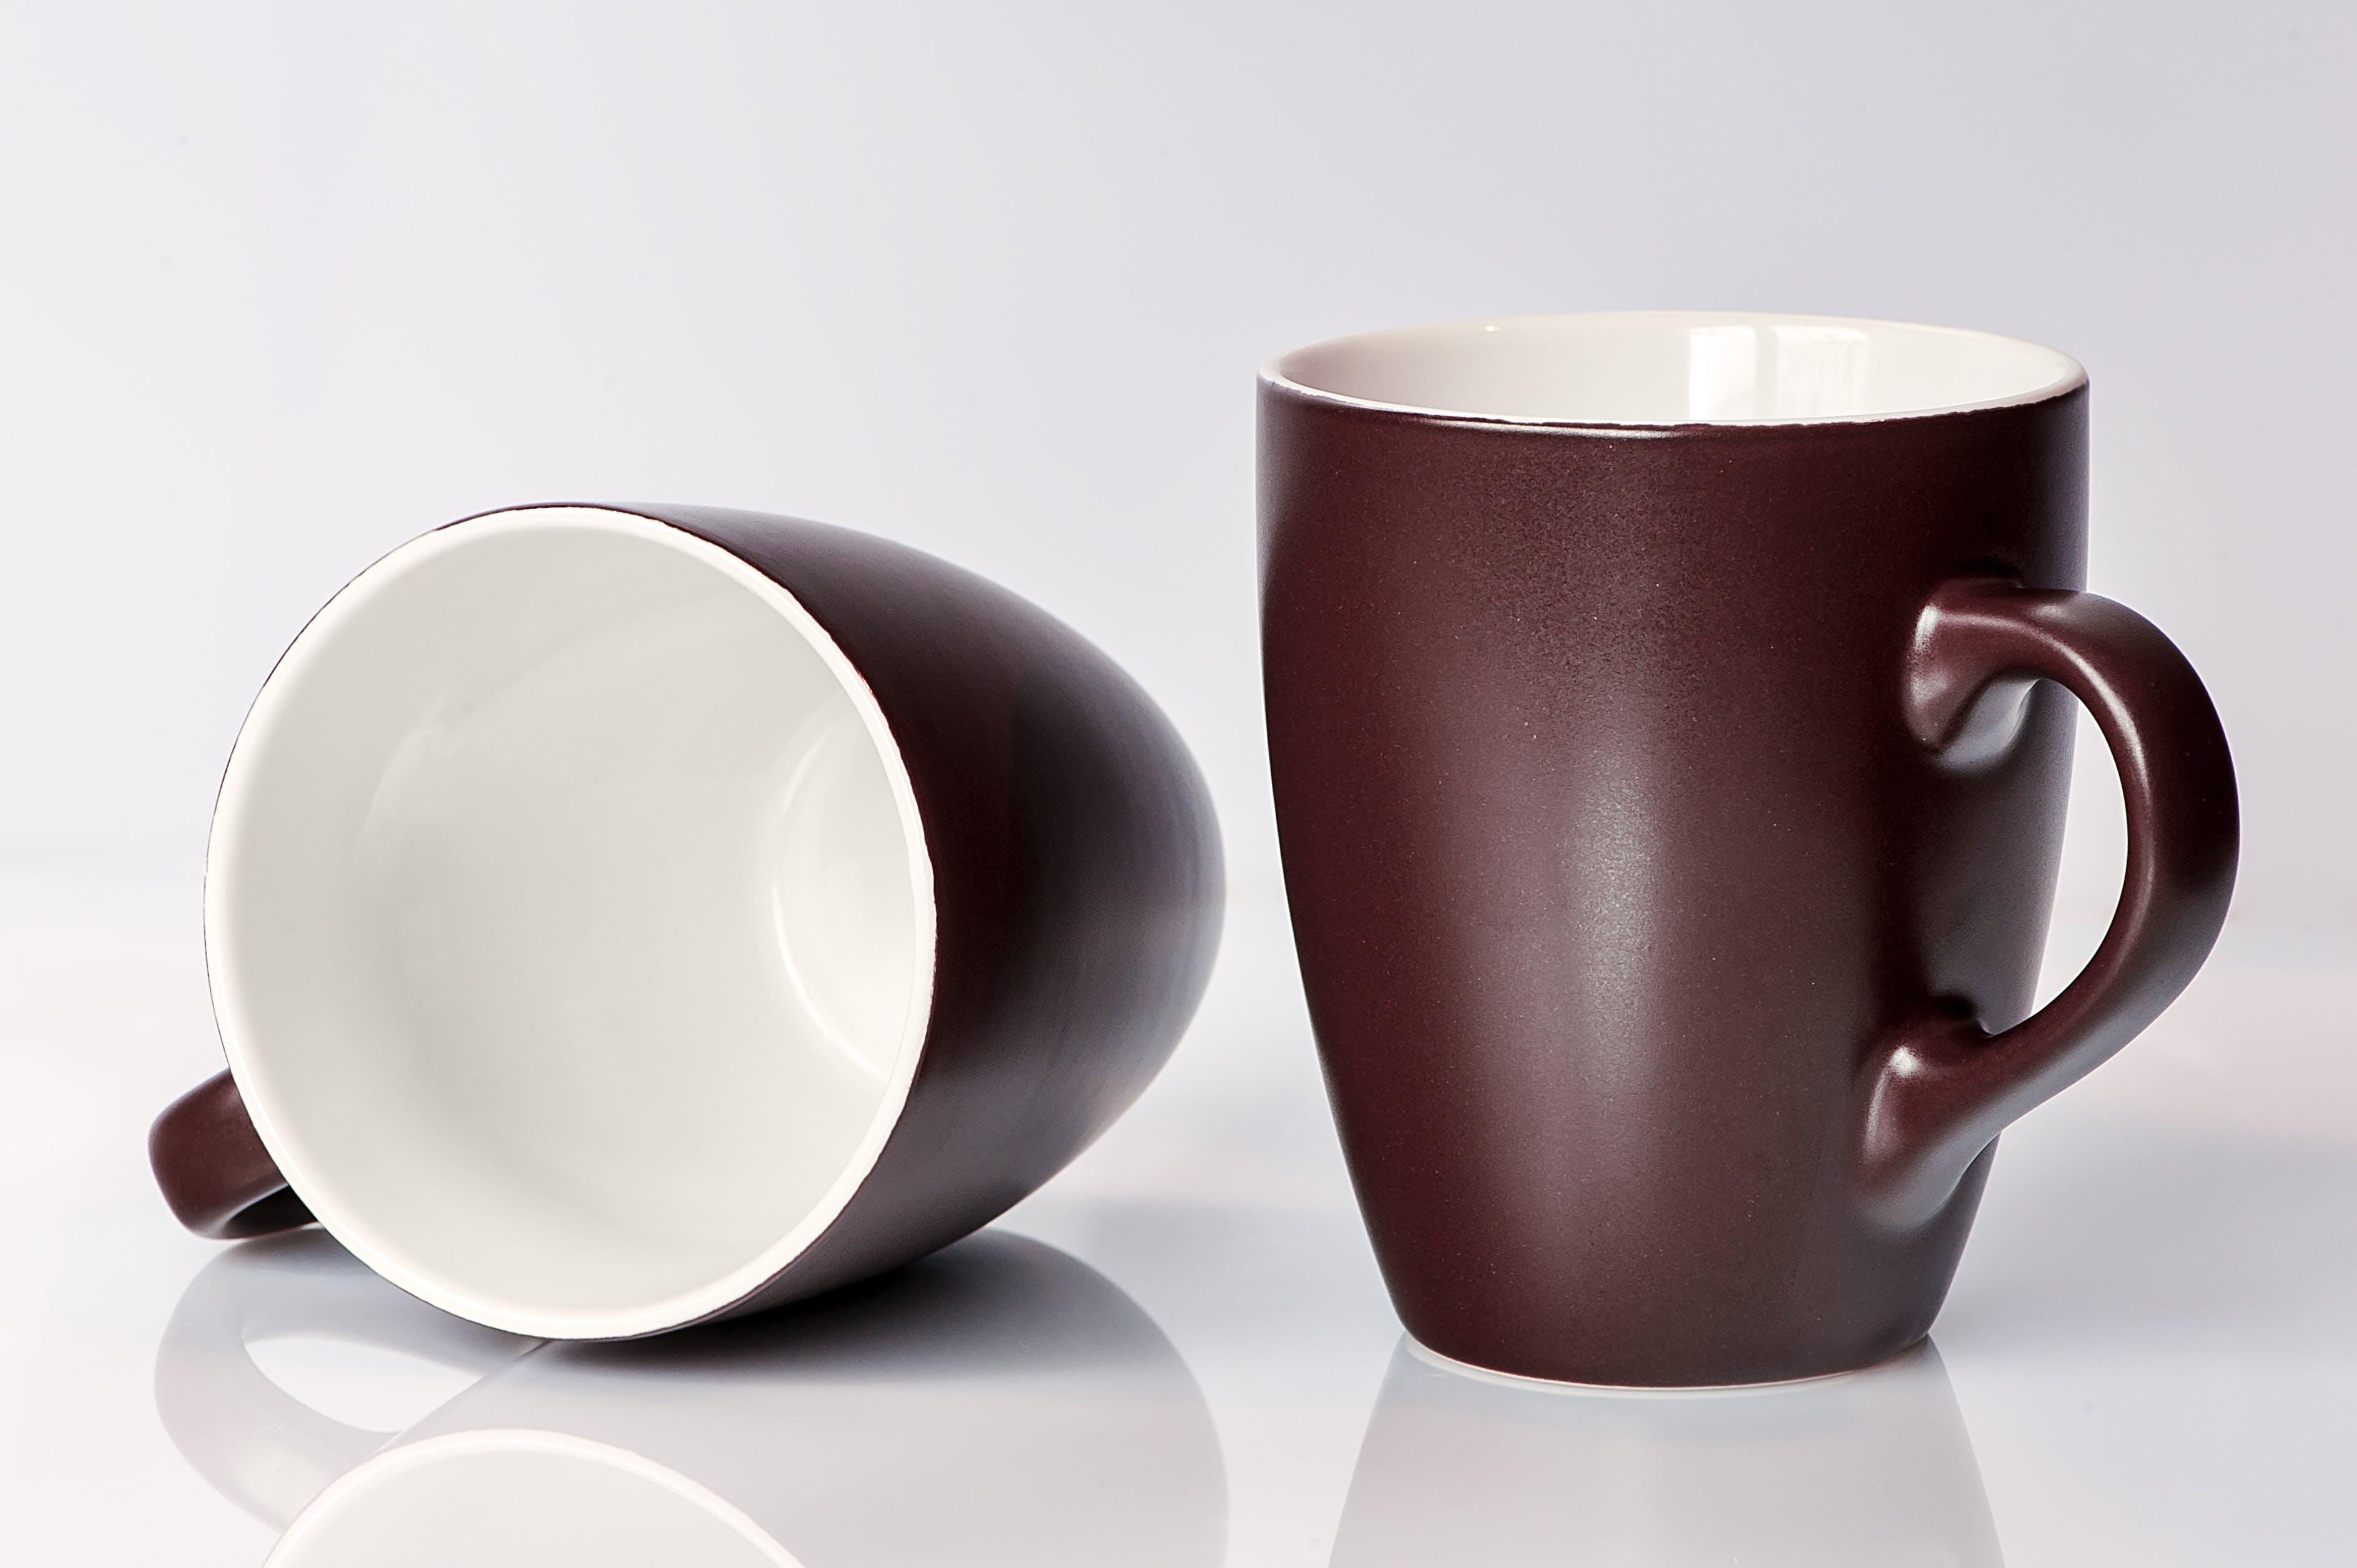 Brown and White Ceramic Mug